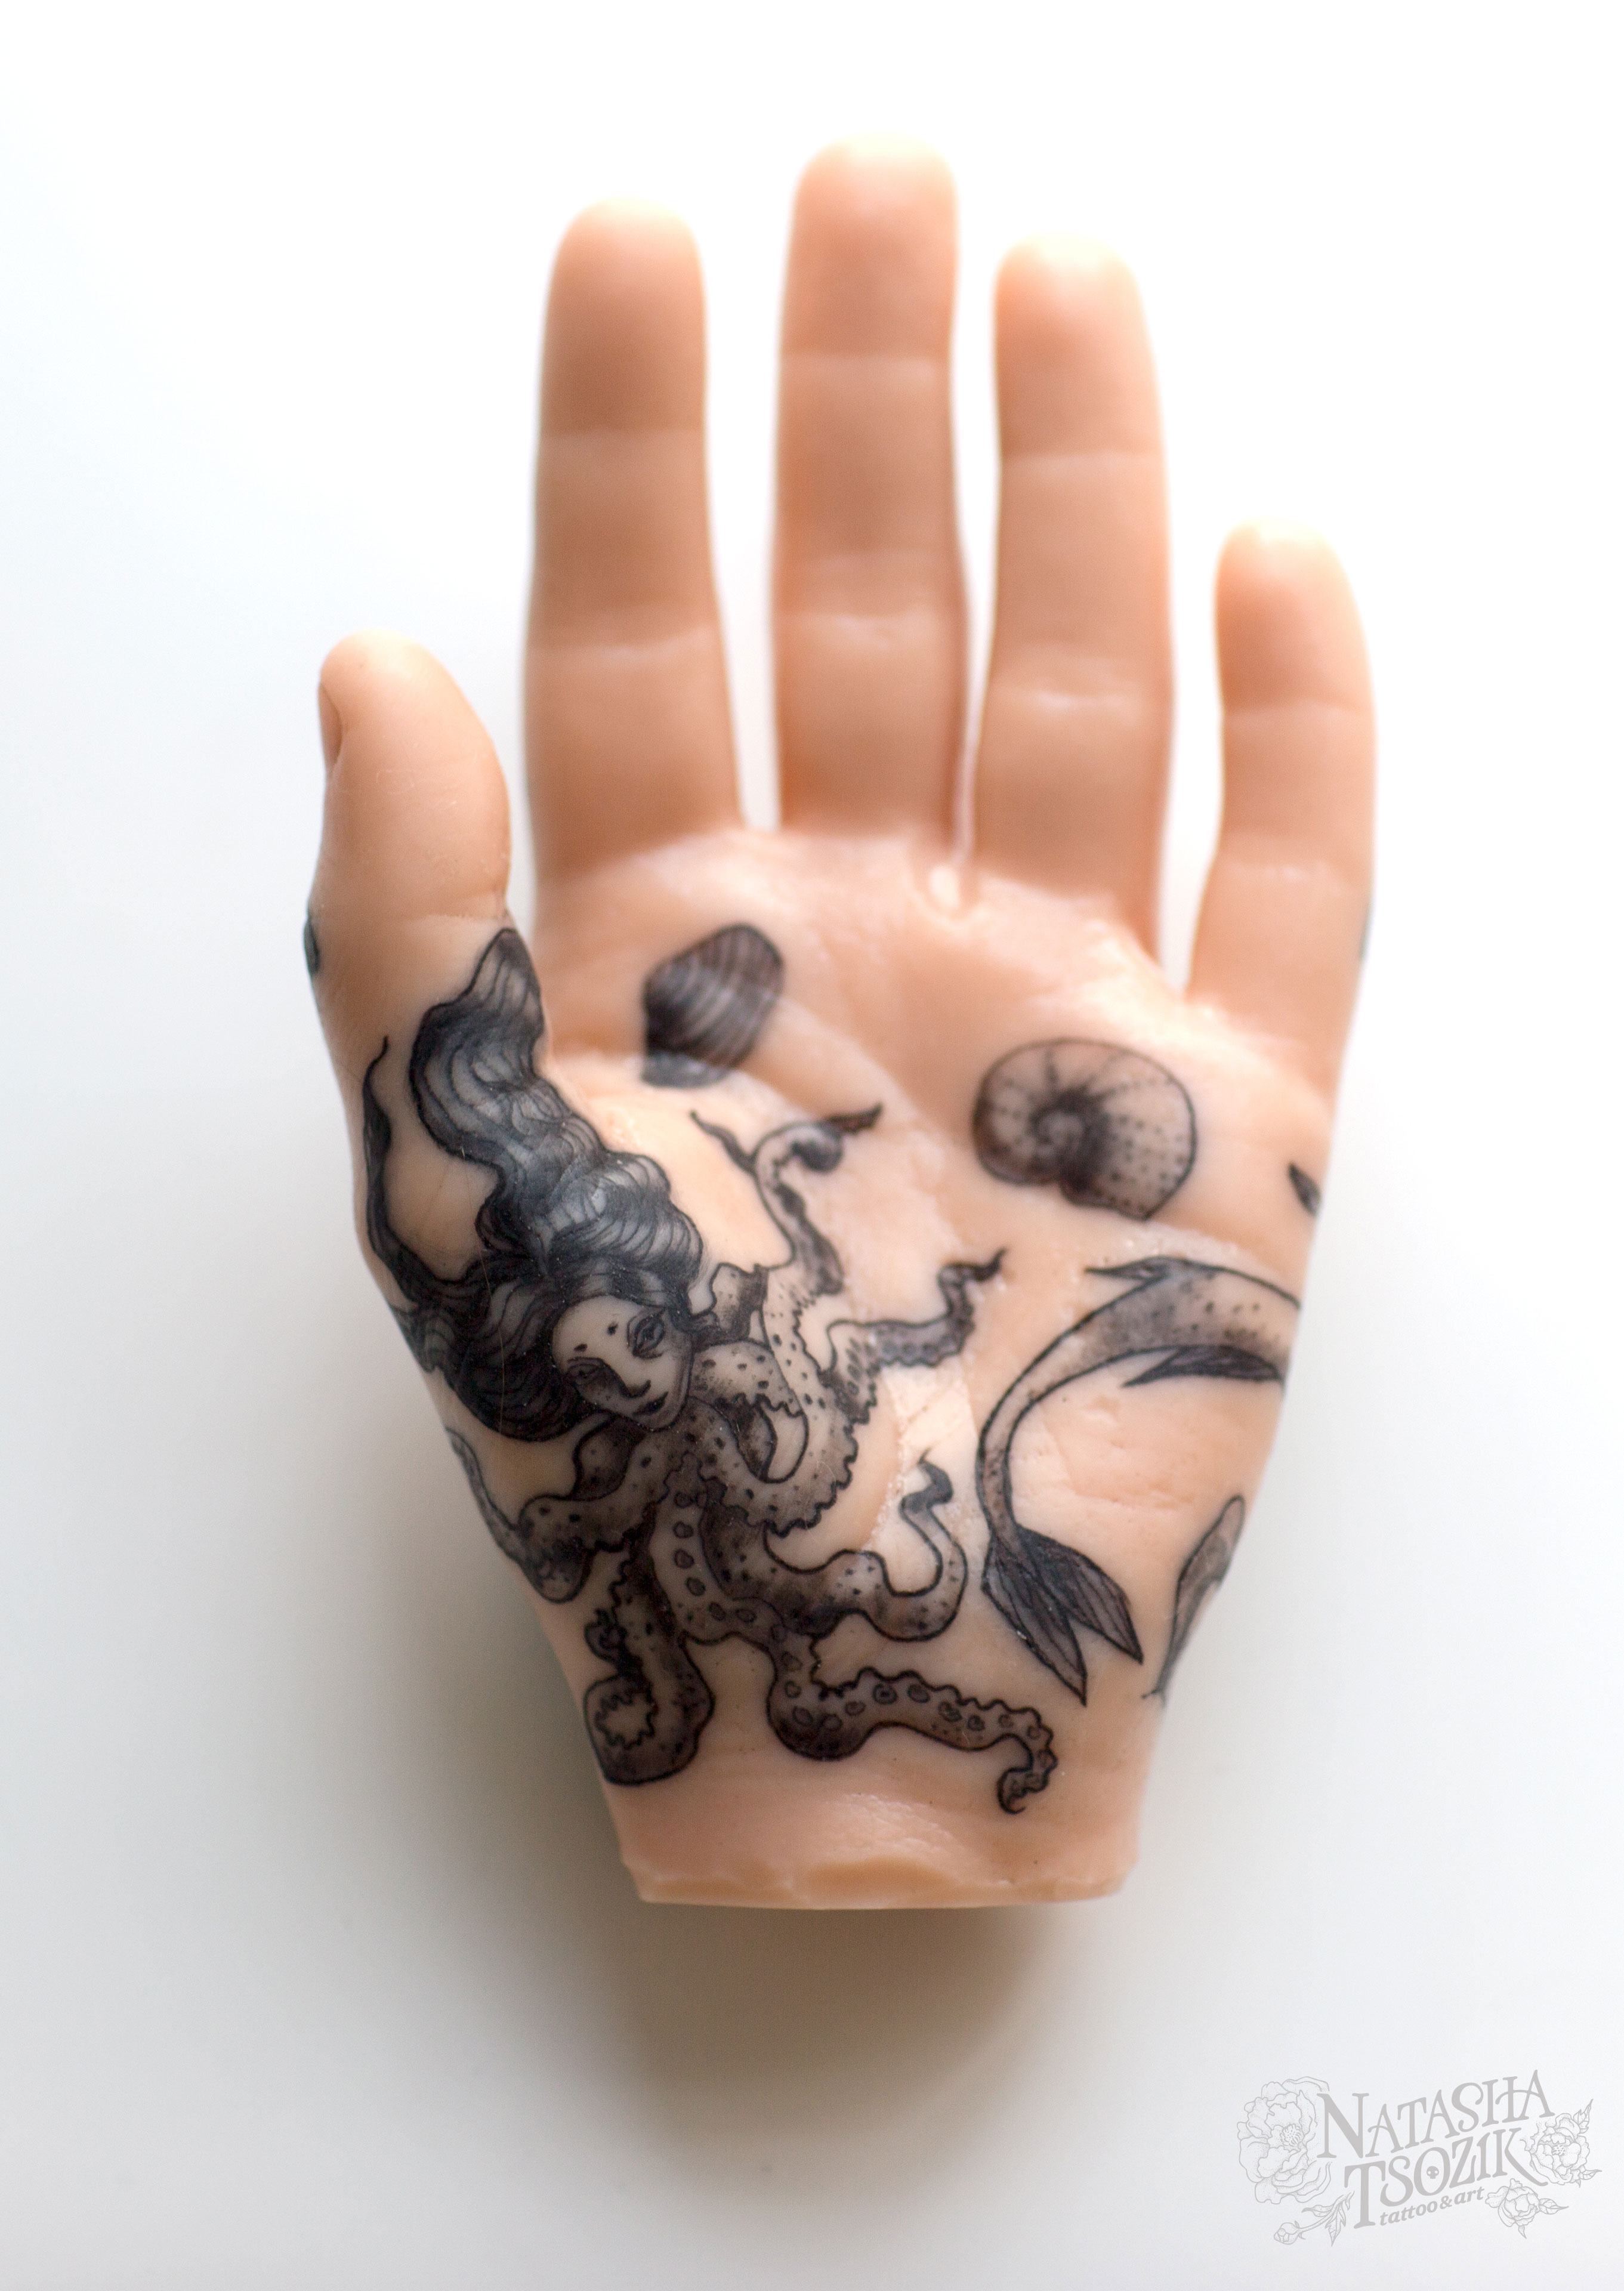 rubber hand1 by Natasha Tsozik